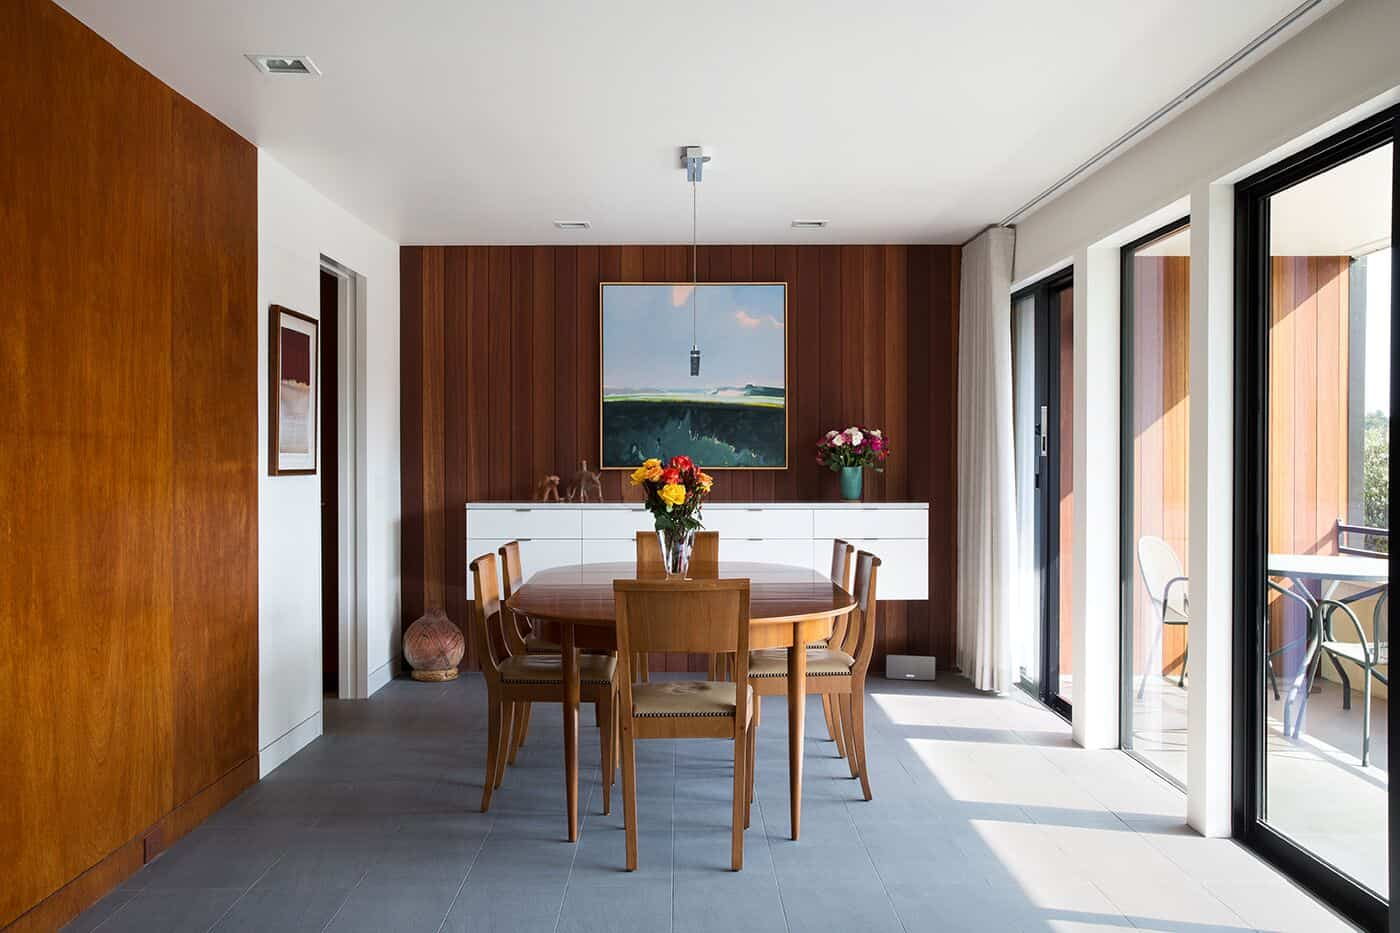 San Francisco Eichler Remodel-Klopf Architecture-08-1 Kindesign